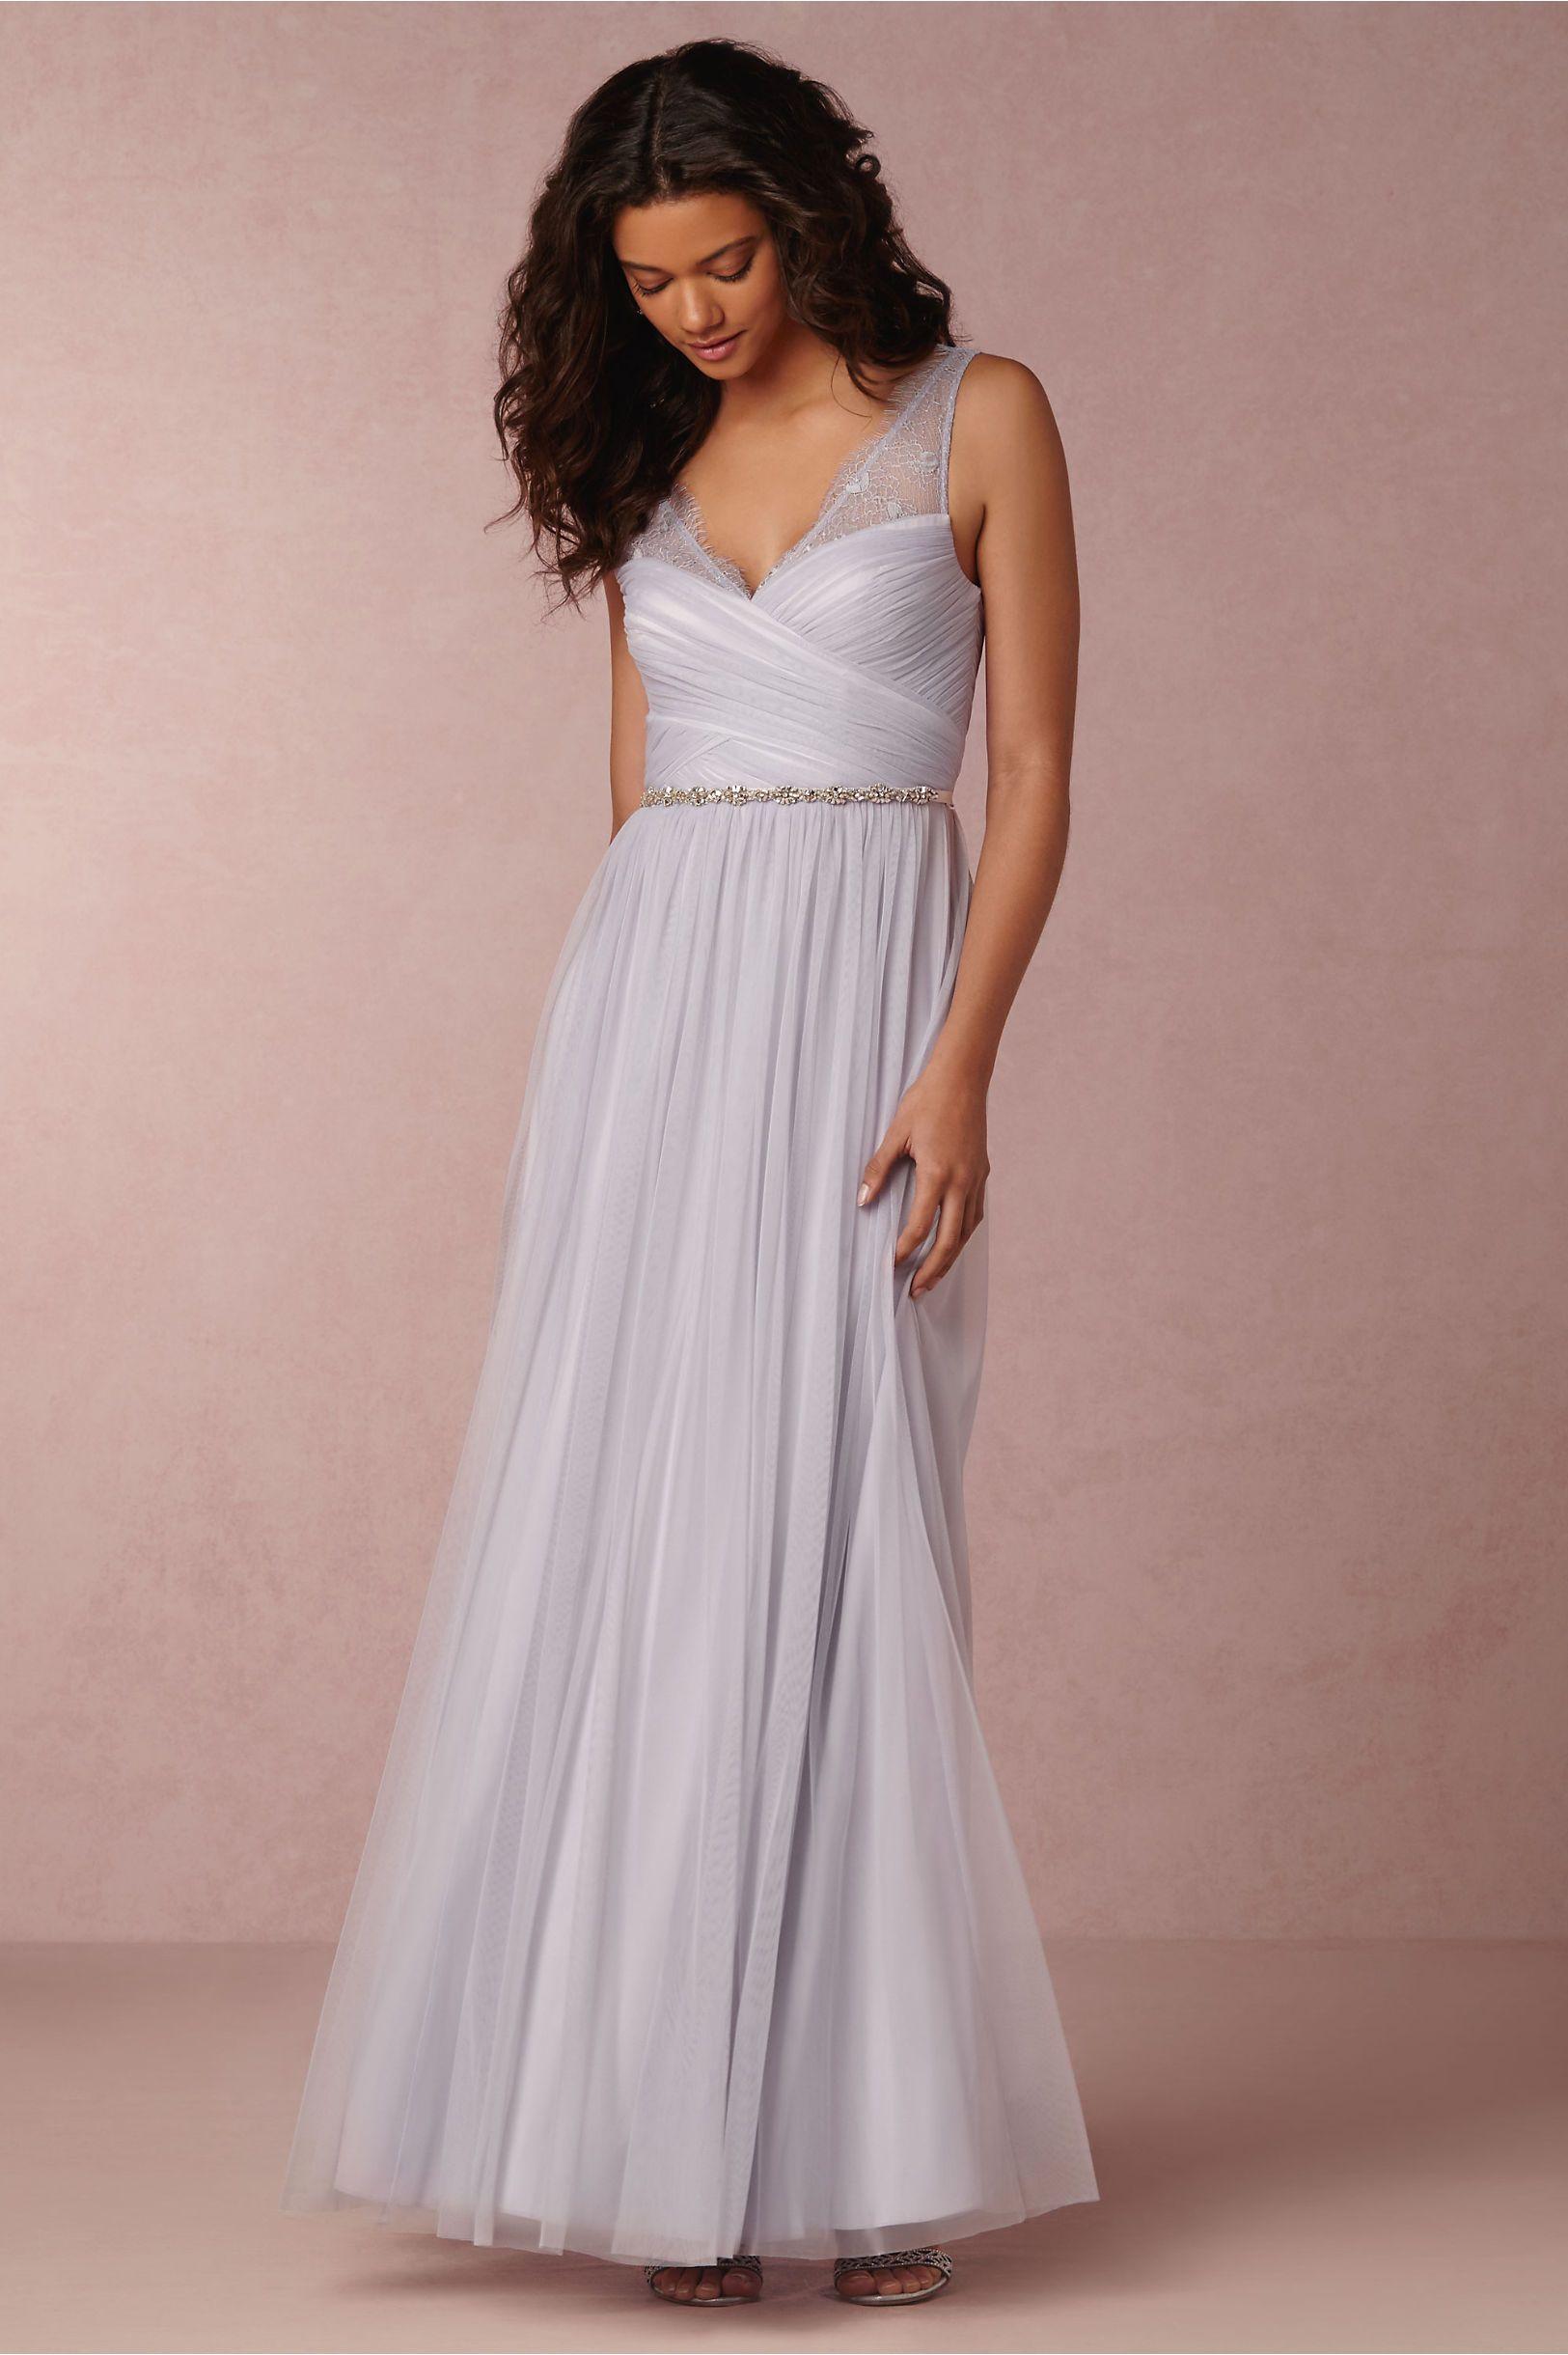 Big girl wedding dresses  BHLDN Fleur Dress in Bridesmaids View All Dresses at BHLDN  Big